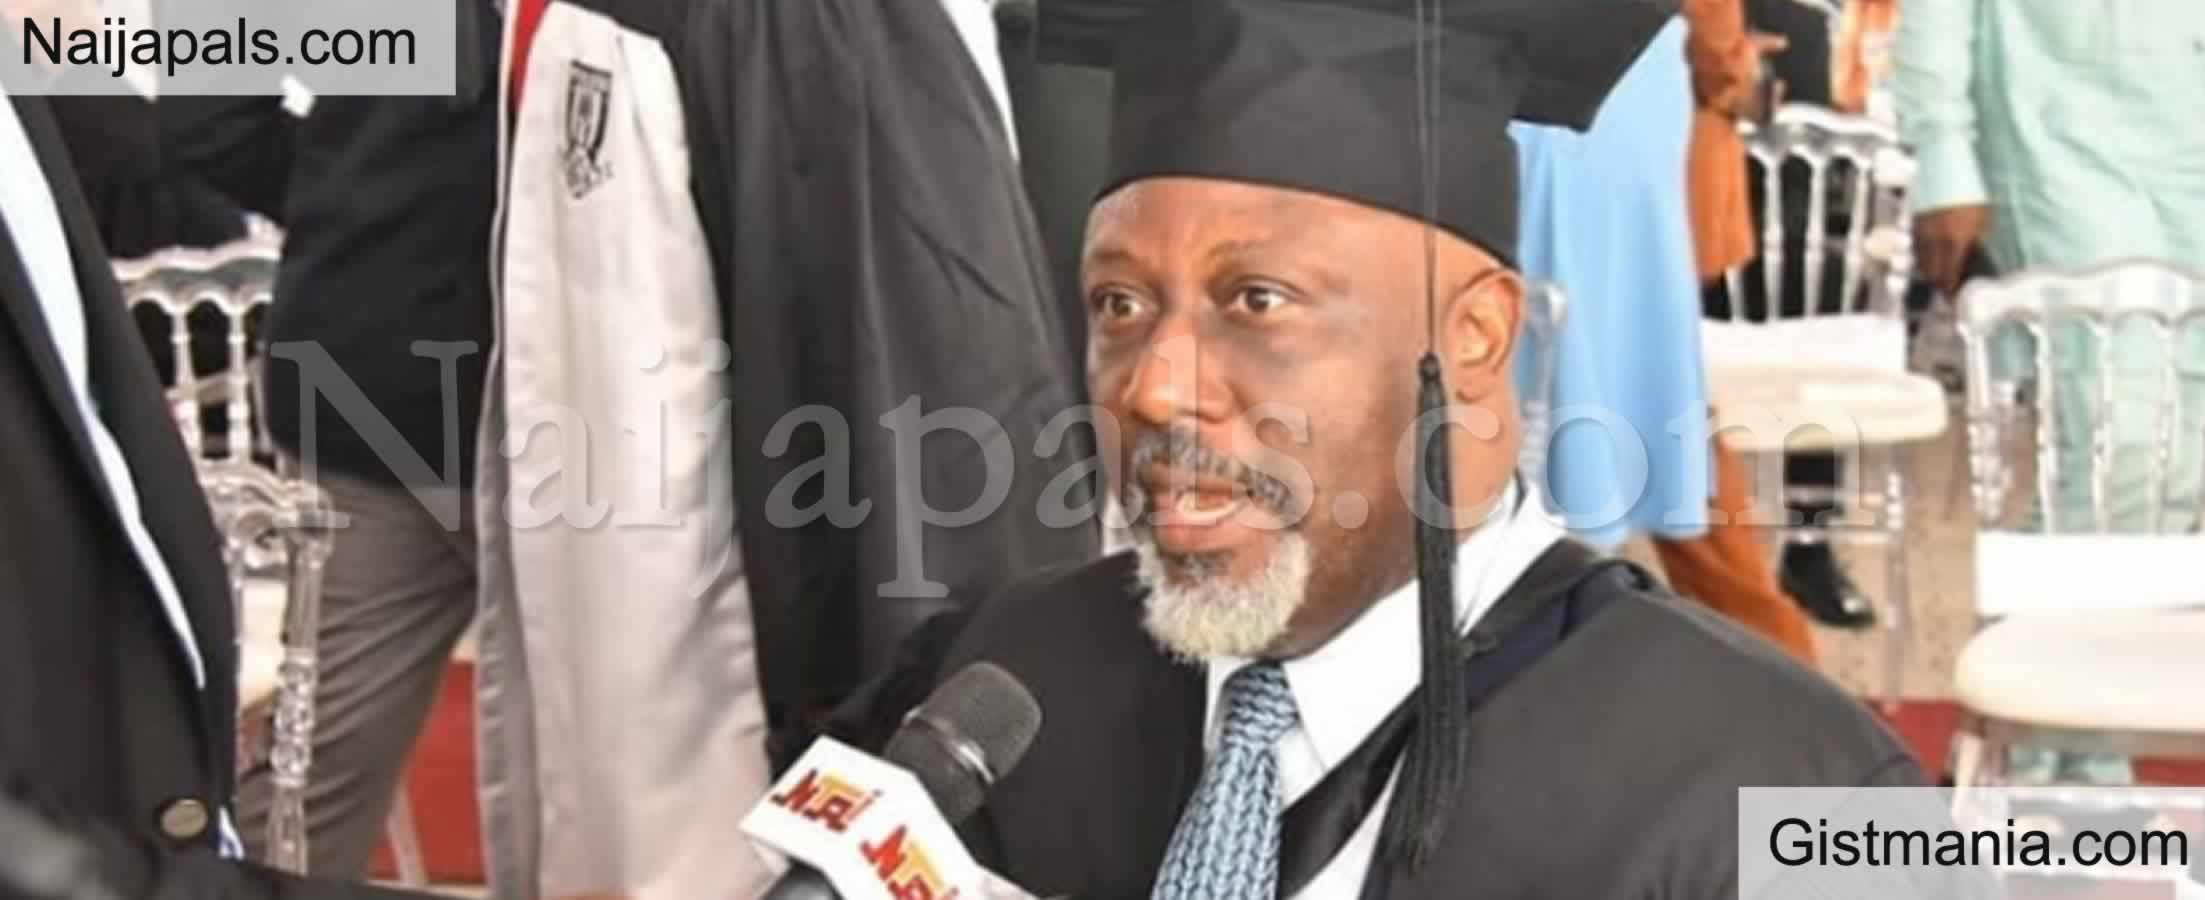 <img alt='.' class='lazyload' data-src='https://img.gistmania.com/emot/news.gif' /> PICS: <b>How Nigerians Were Mislead Over Senator Dino Melaye Graduation As Law Best Student</b>